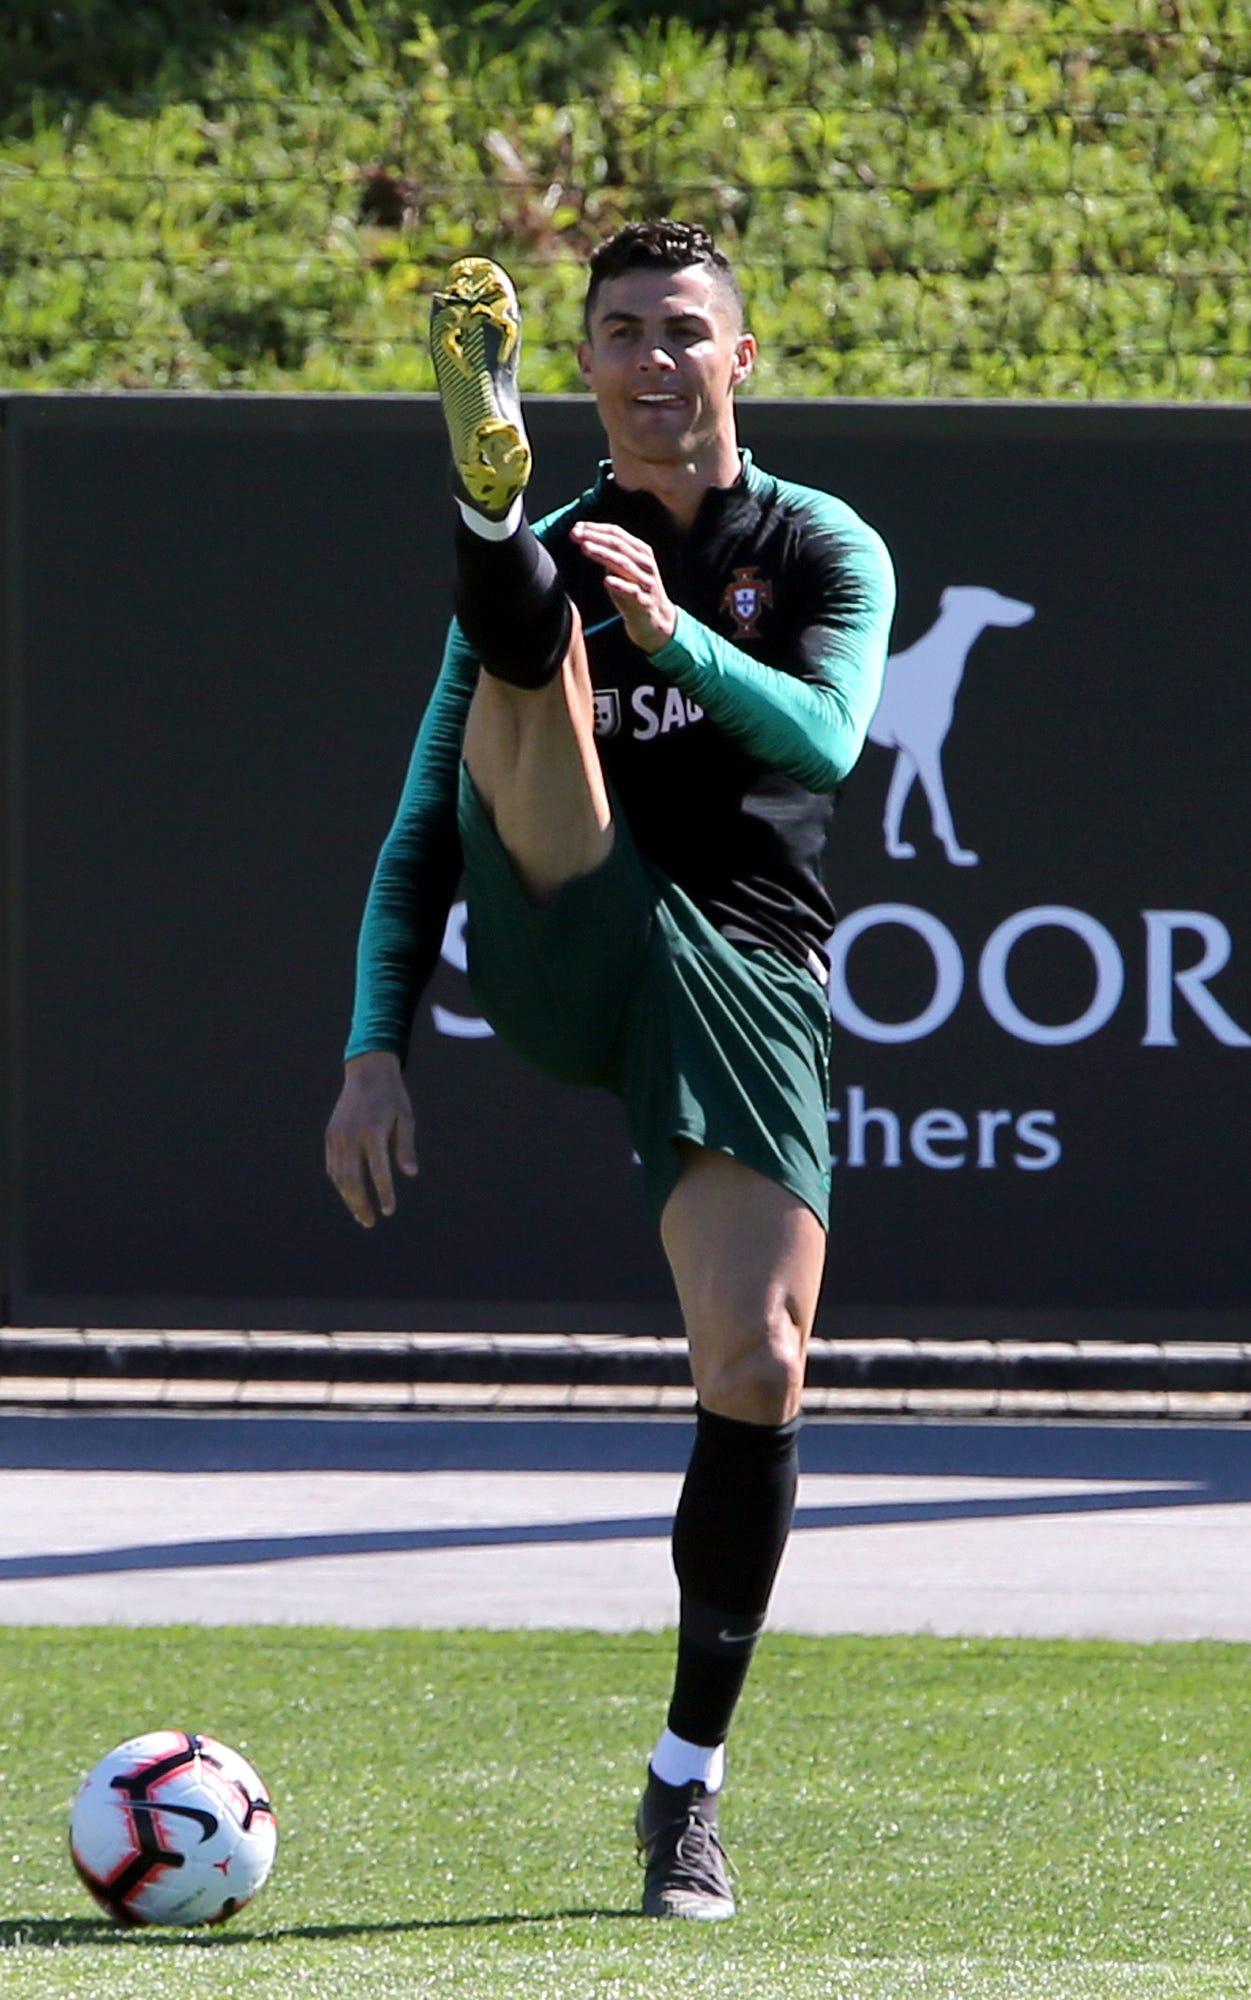 Cristiano Ronaldo fined $22K by UEFA for obscene gesture